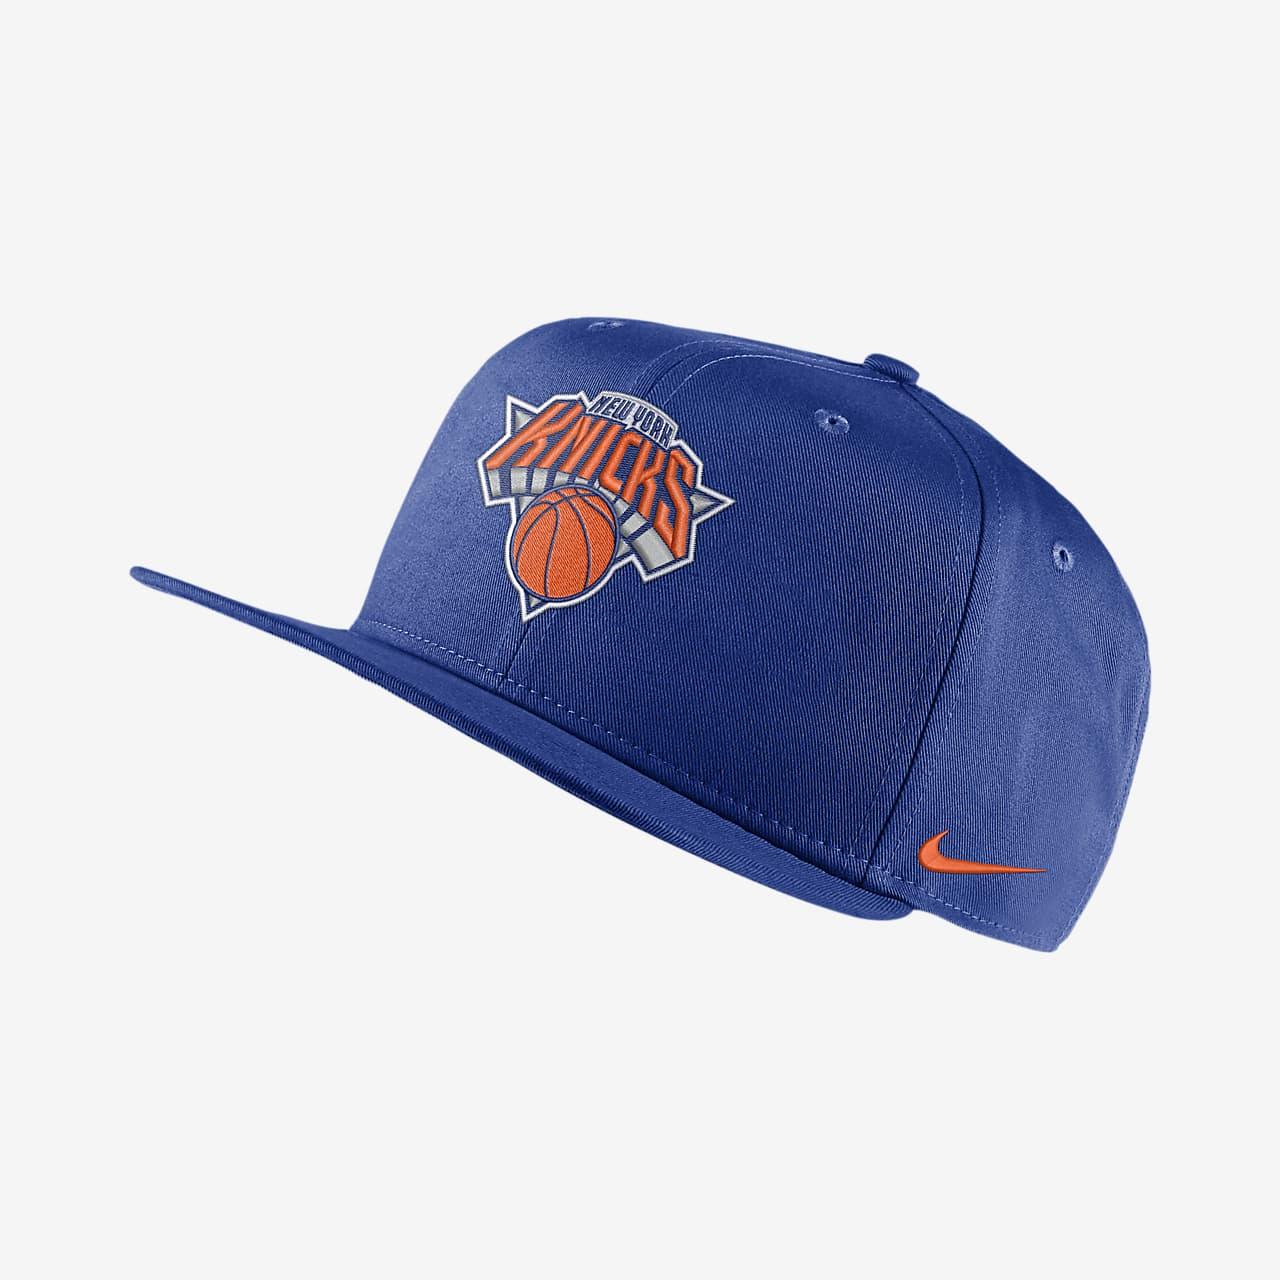 New York Knicks Nike Pro NBA-pet